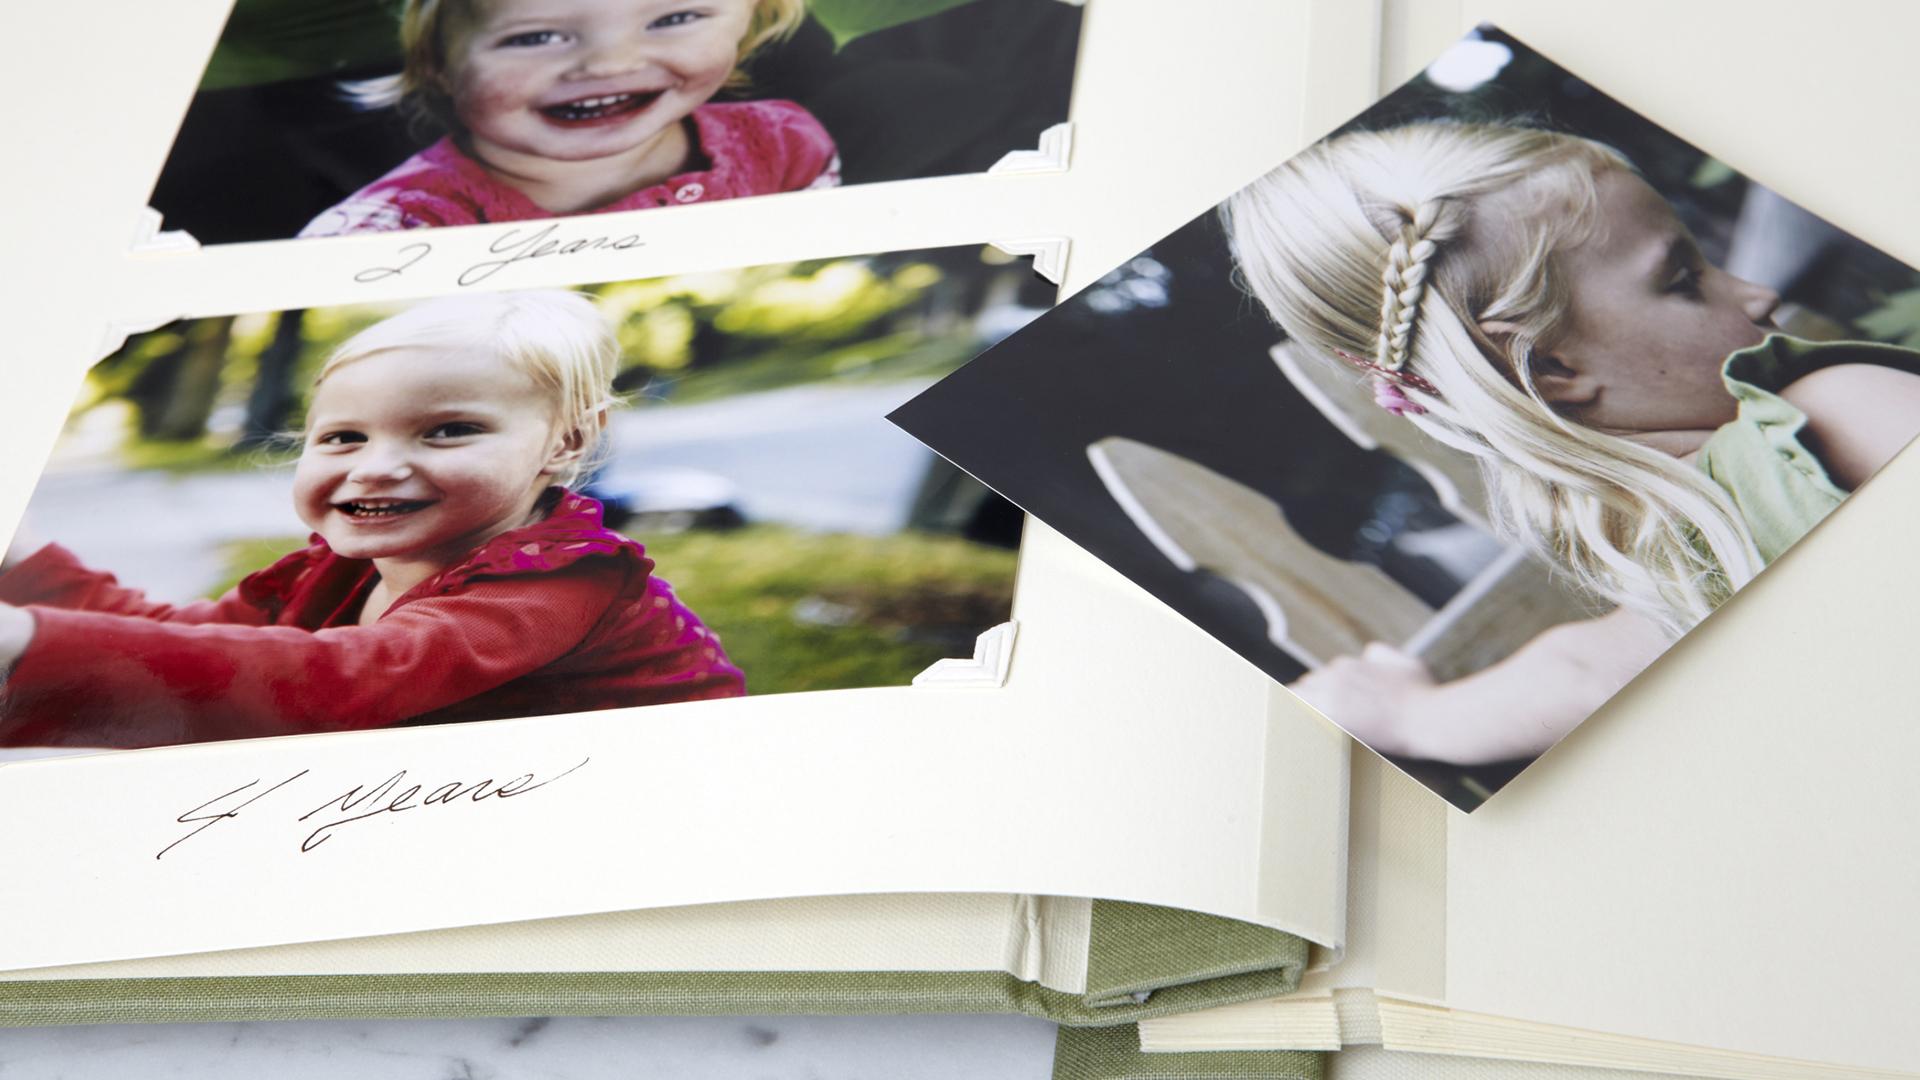 Scrapbook or photo album | Sheknows.com